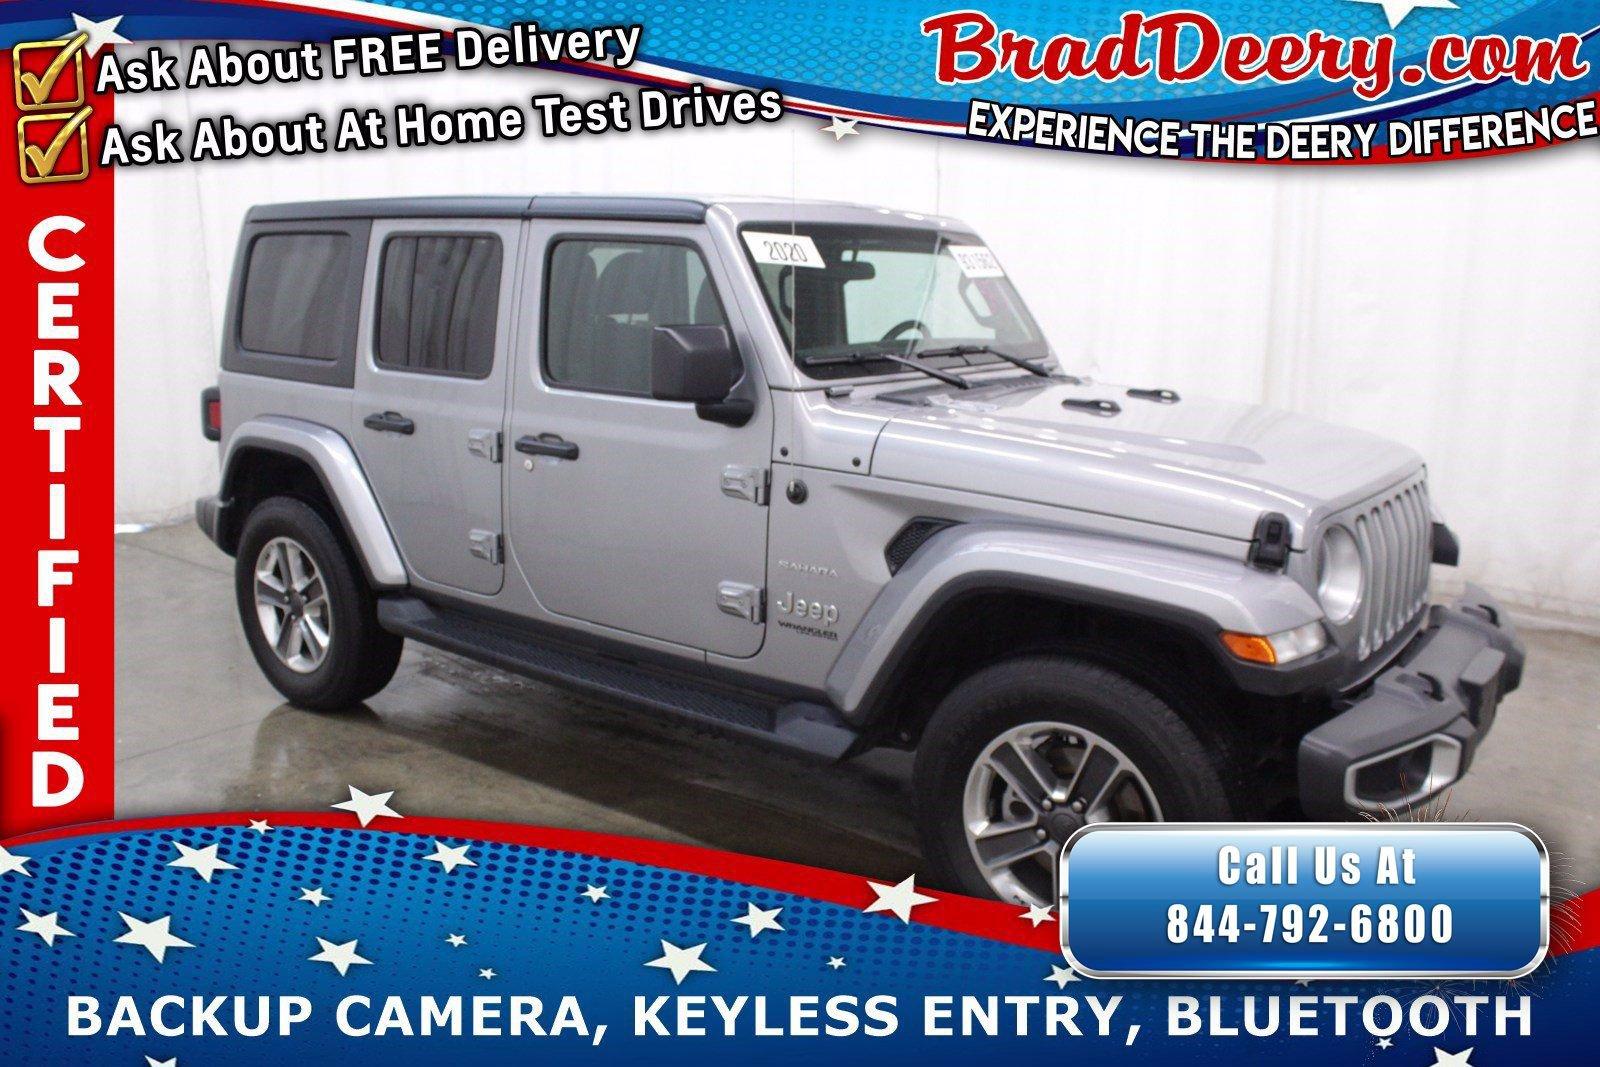 2020 Jeep Wrangler Unlimited 4-Door Sahara 4x4  **JEEP CERTIFIED** w/ 3-Piece Hardtop, Back-Up Camera & Push Button Start